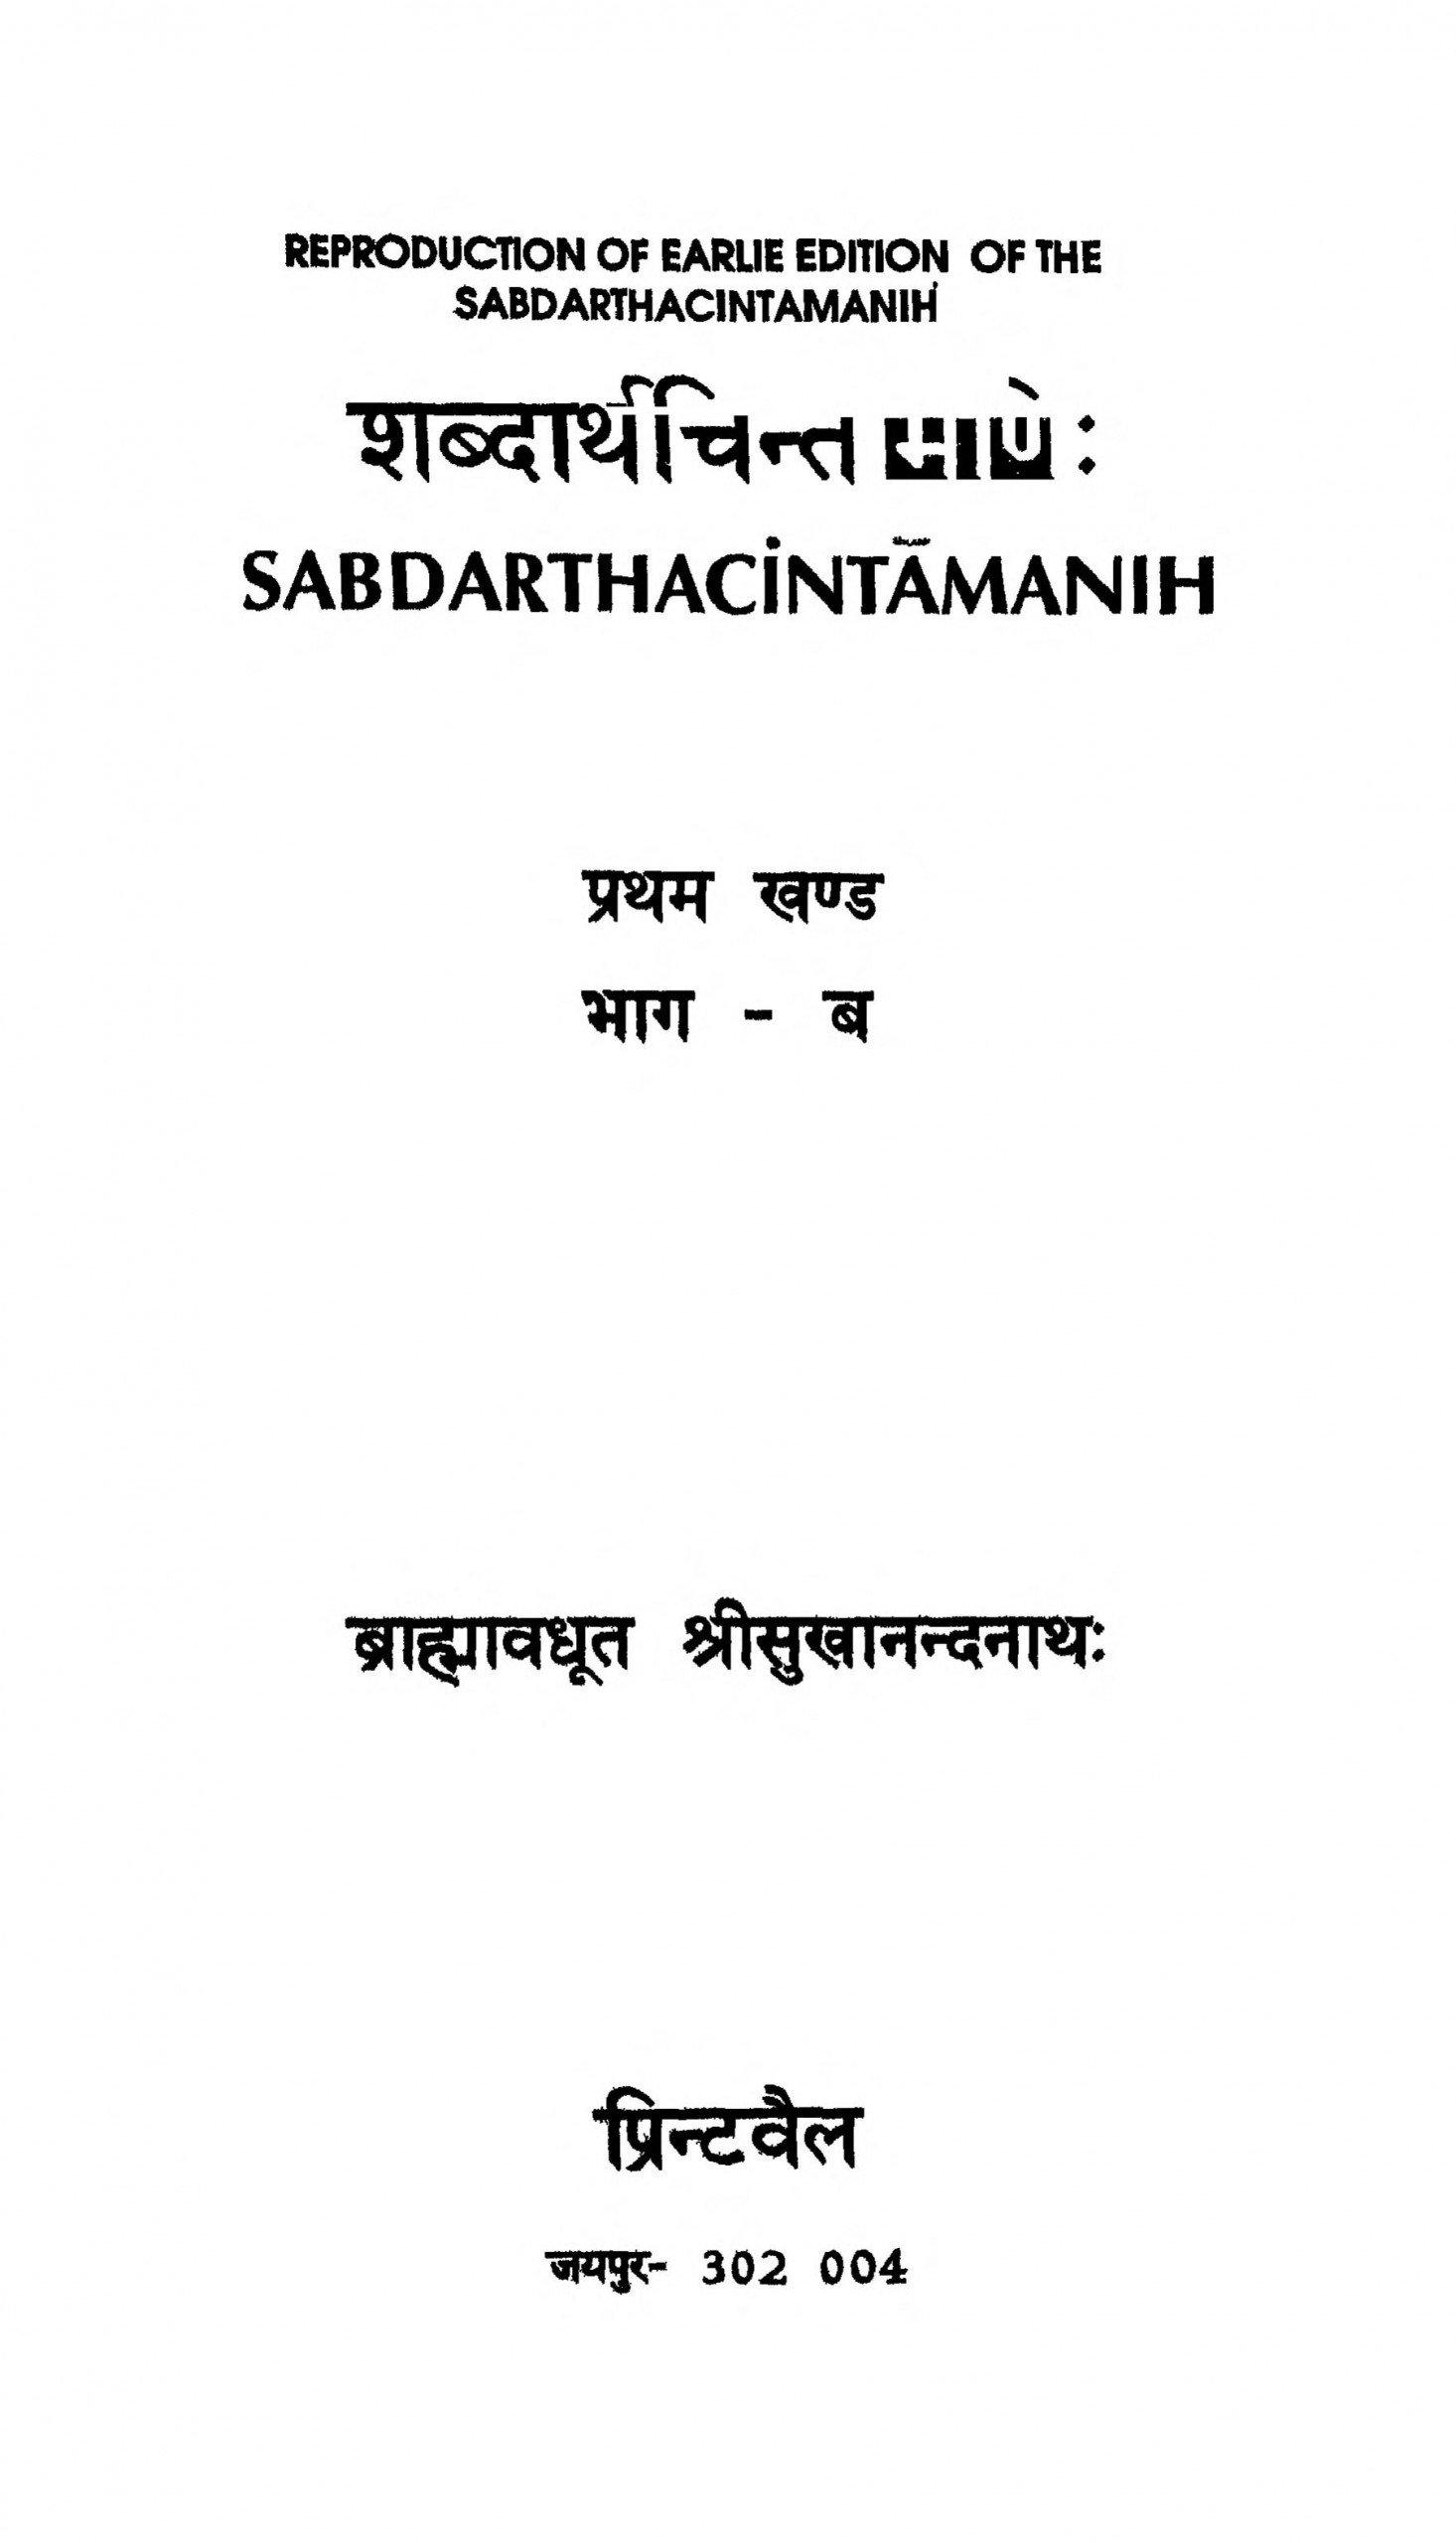 Book Image : शब्दार्थ चिन्तमाणे खंड 1 भाग ब - Sasabdartha Chintamane Khand 1 Bhag B